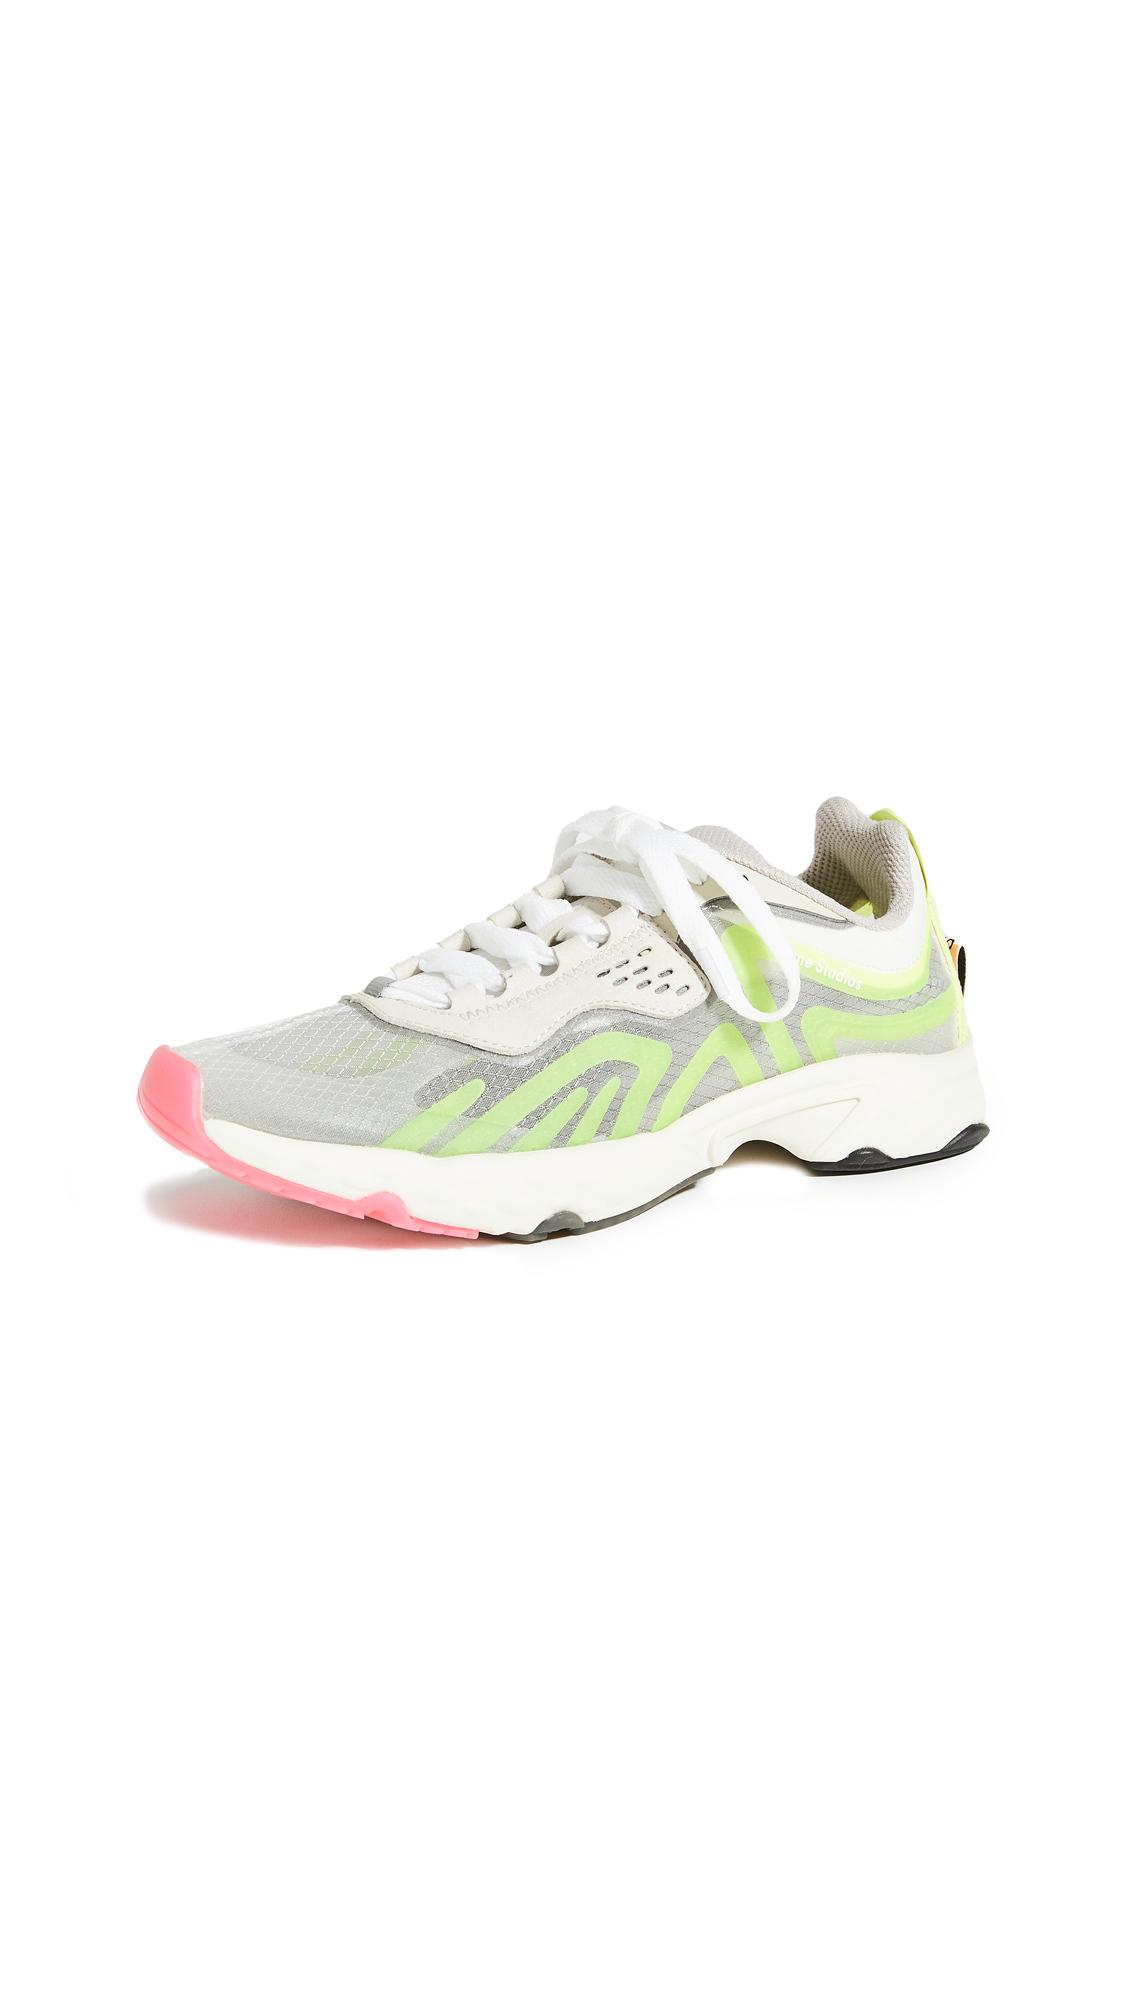 Buy Acne Studios Trail Sneakers online, shop Acne Studios